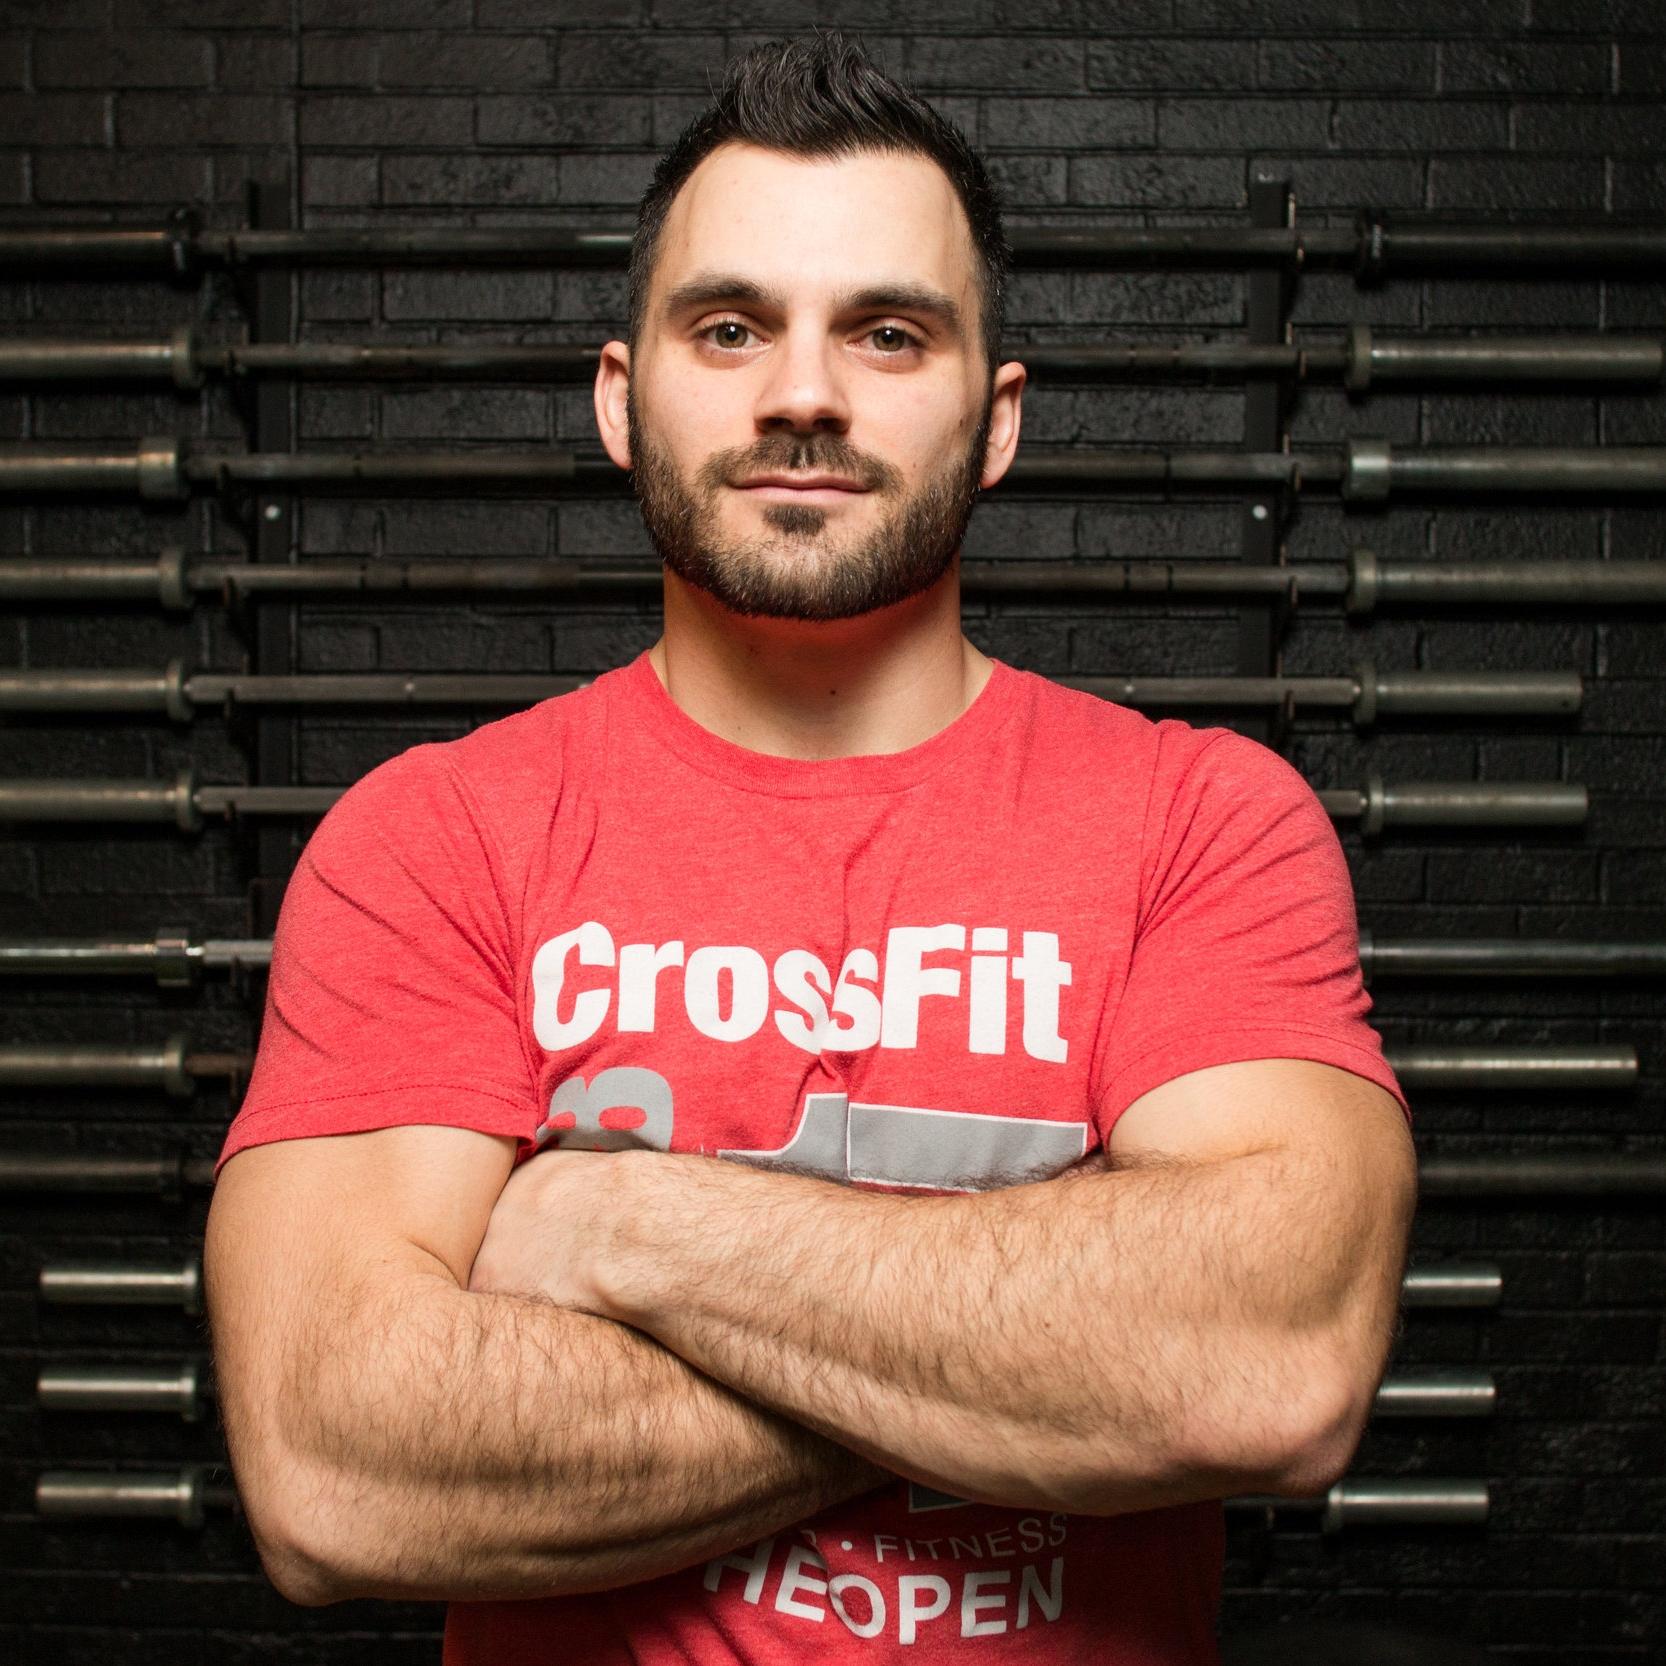 CrossFit Level 1 Trainer, Head of Programming